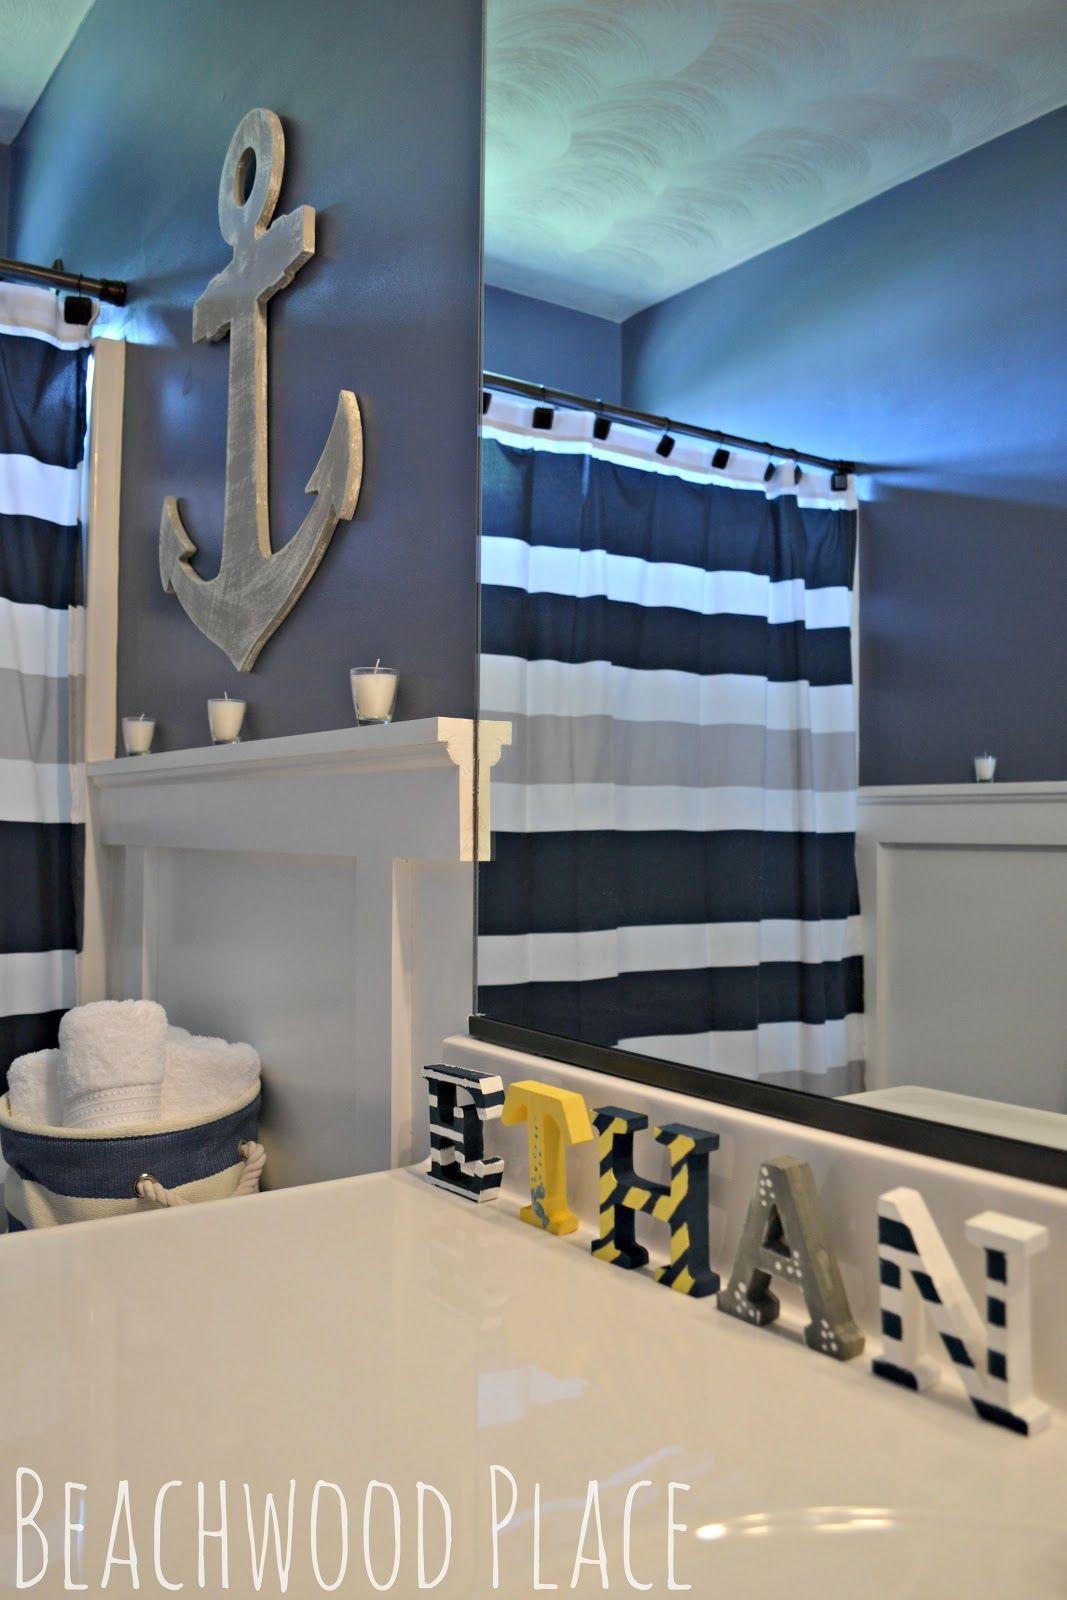 Beachwood Place Is A Design Blog Featuring Interior Design